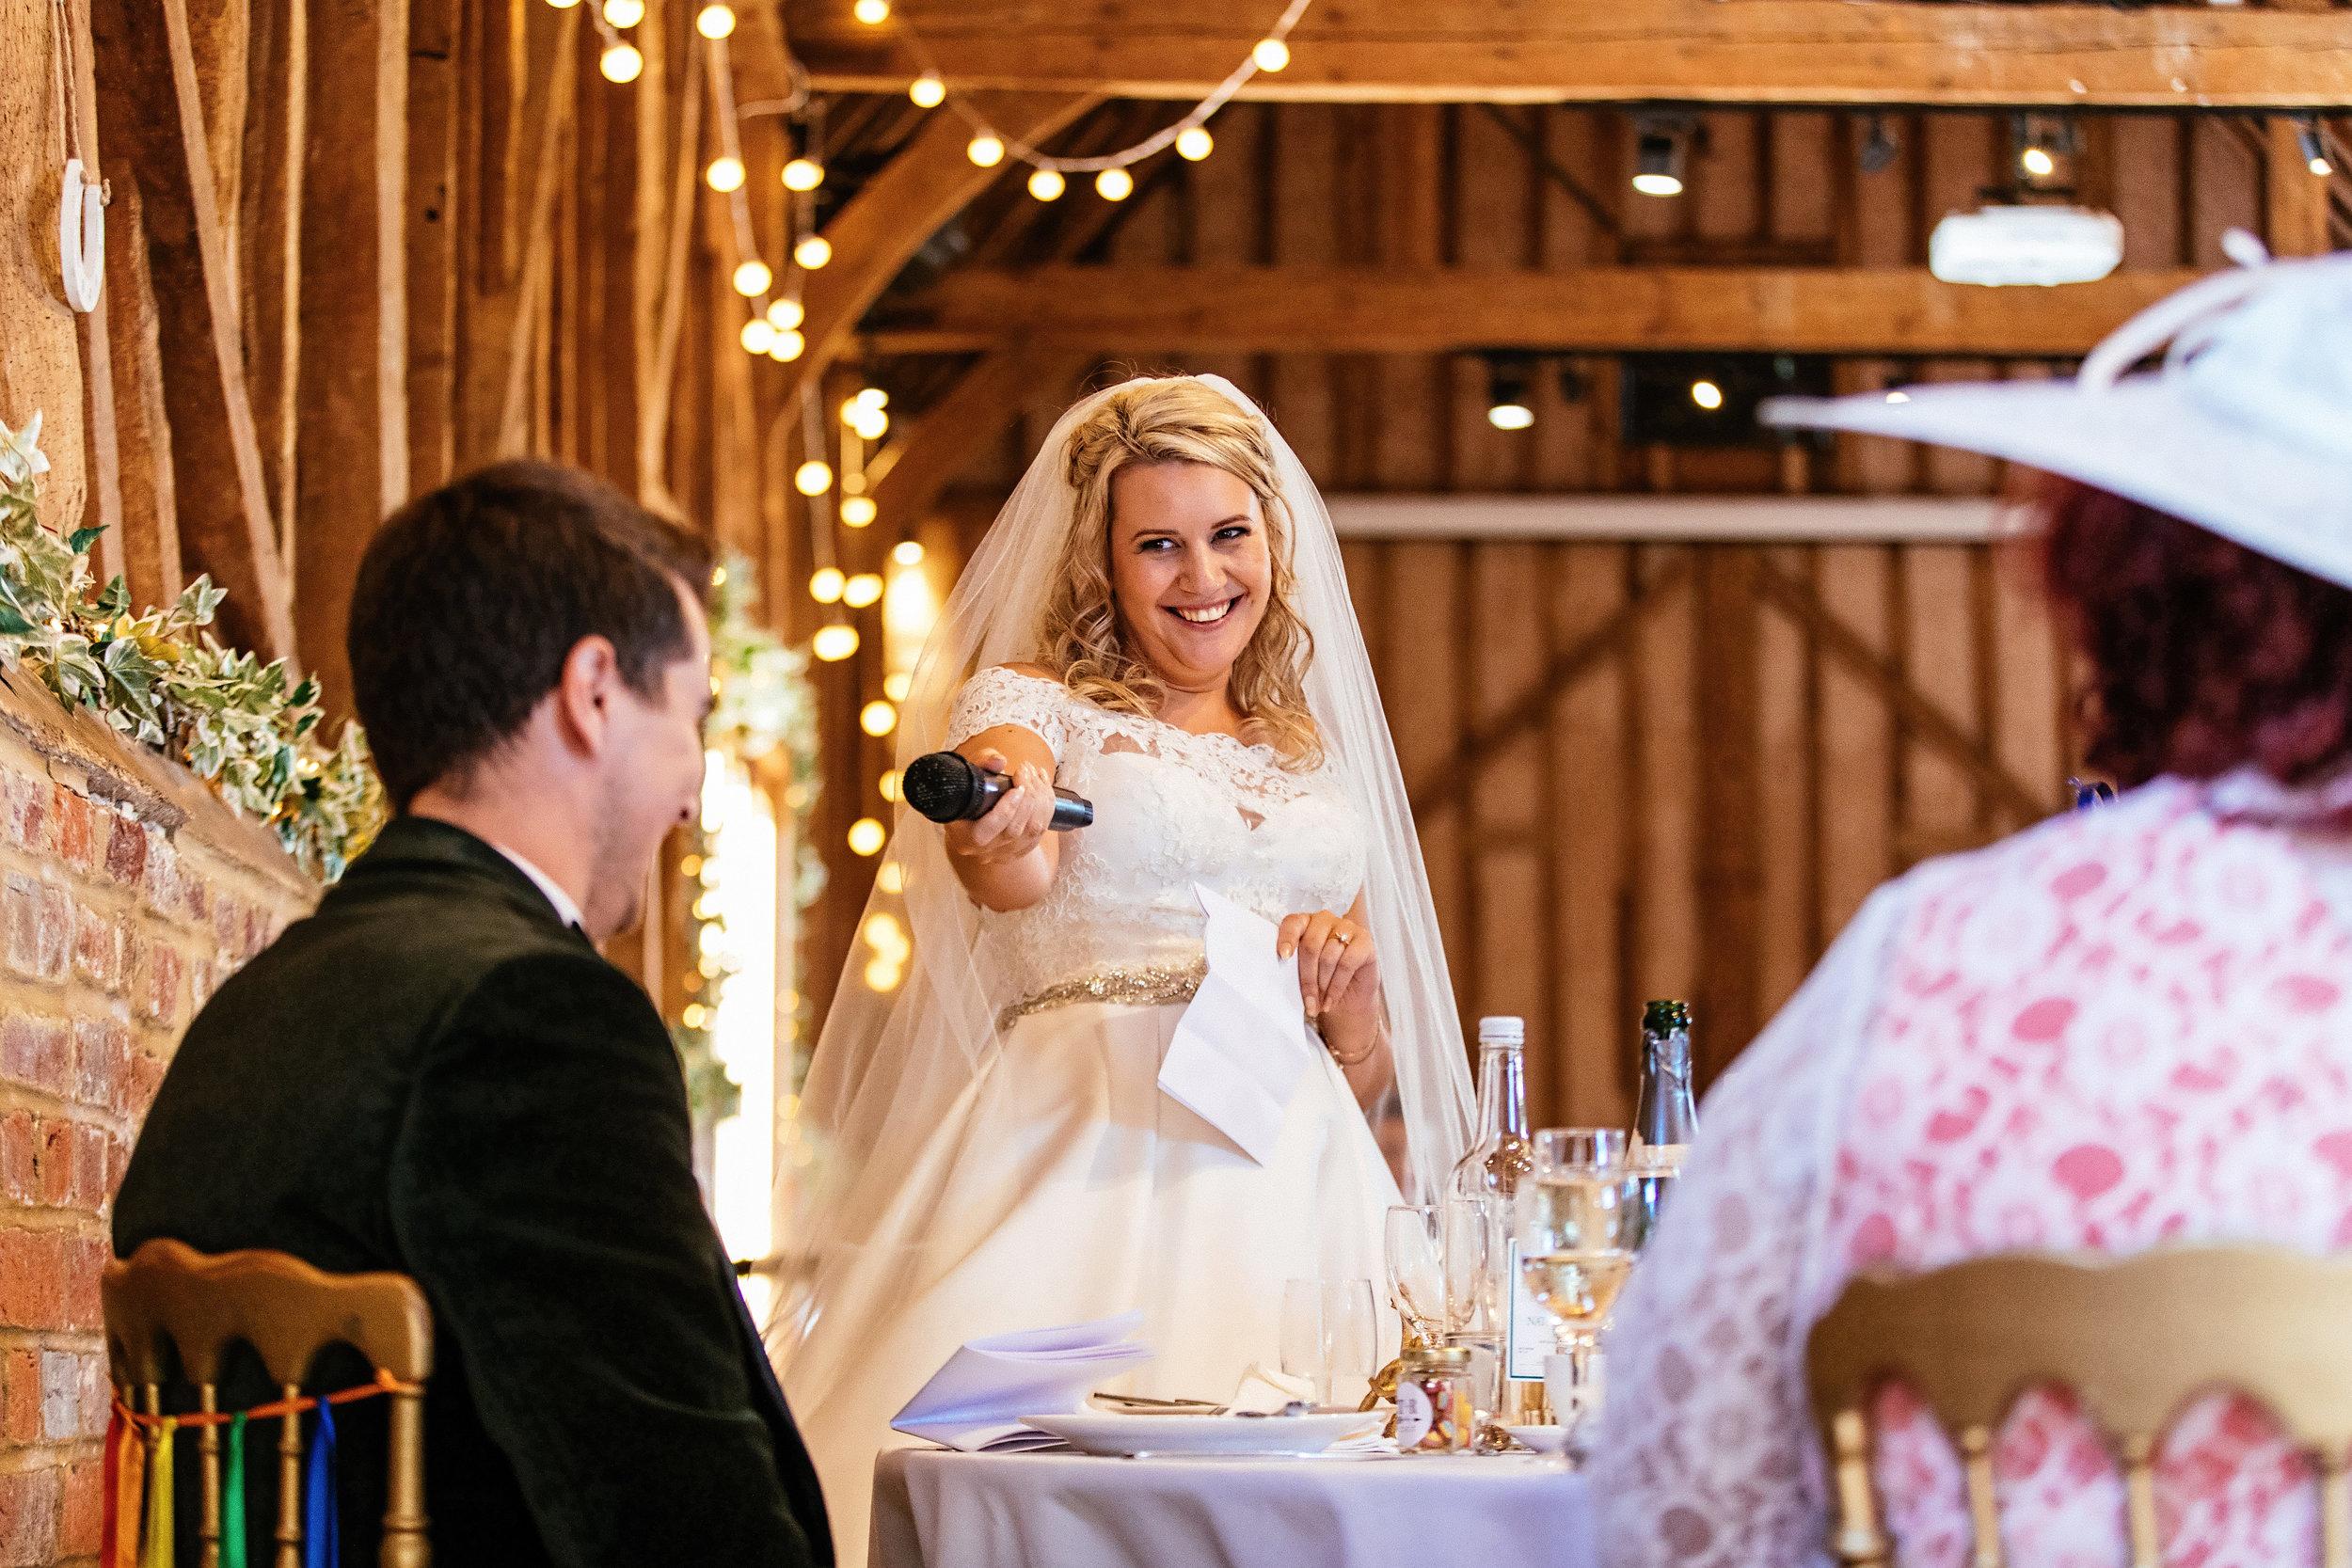 Tamara-and-Richard-Wedding-Highlights-66.jpg